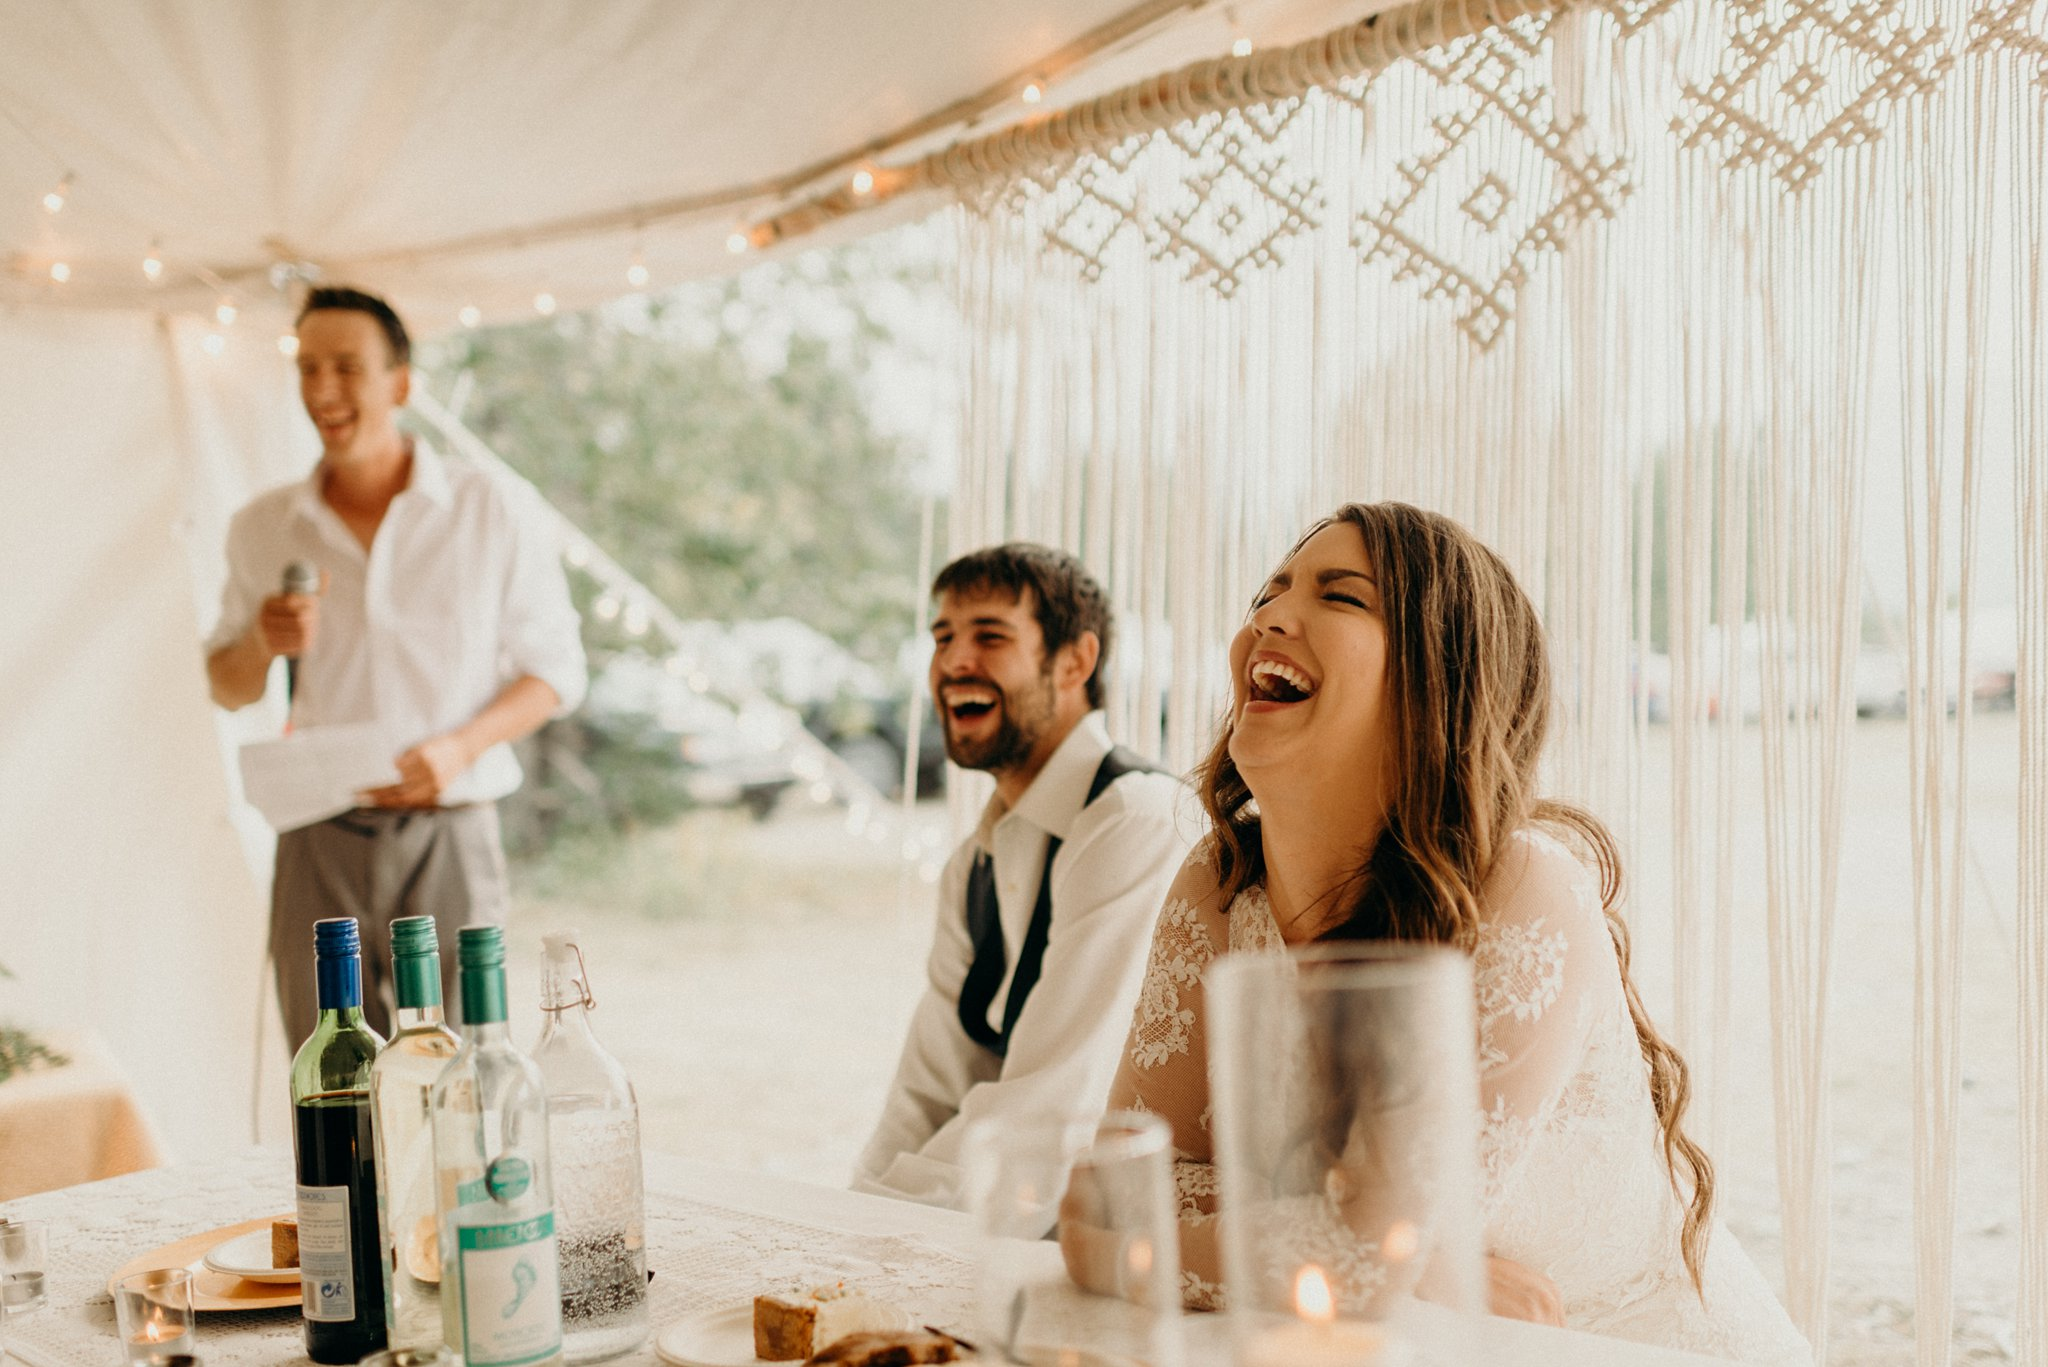 kaihla_tonai_intimate_wedding_elopement_photographer_6781.jpg